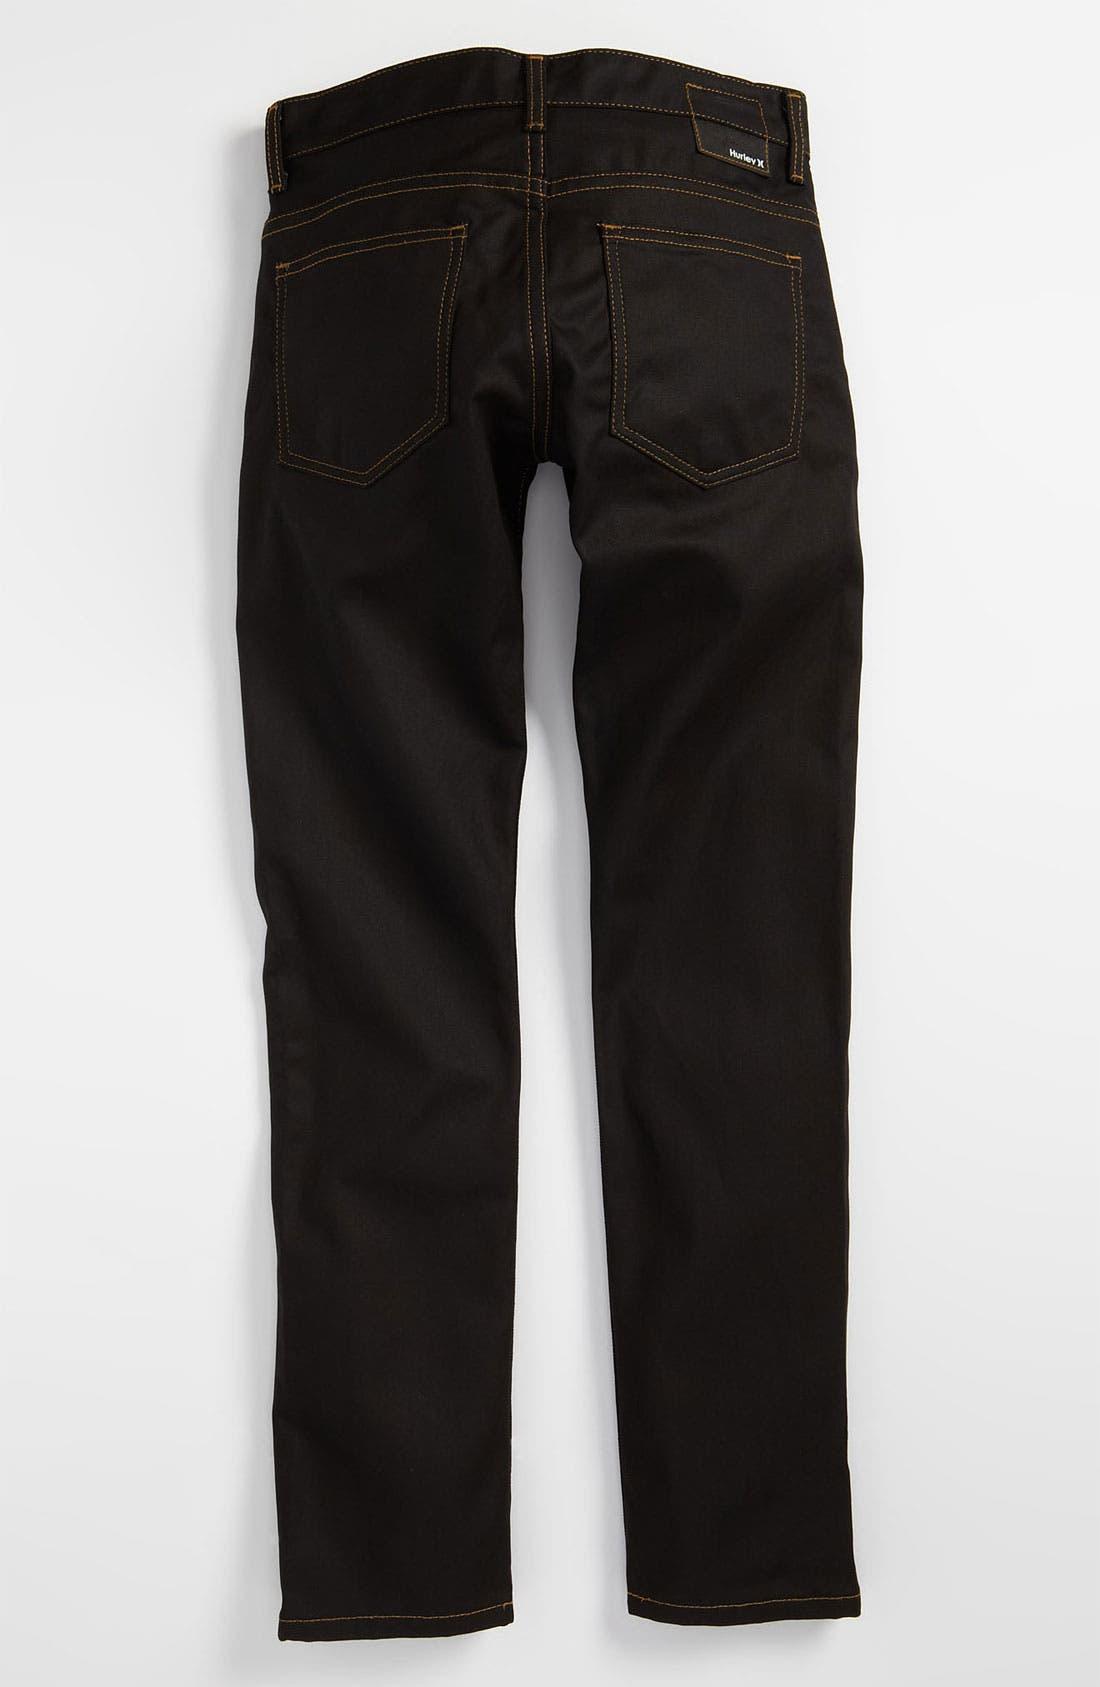 Main Image - Hurley '79' Jeans (Big Boys)